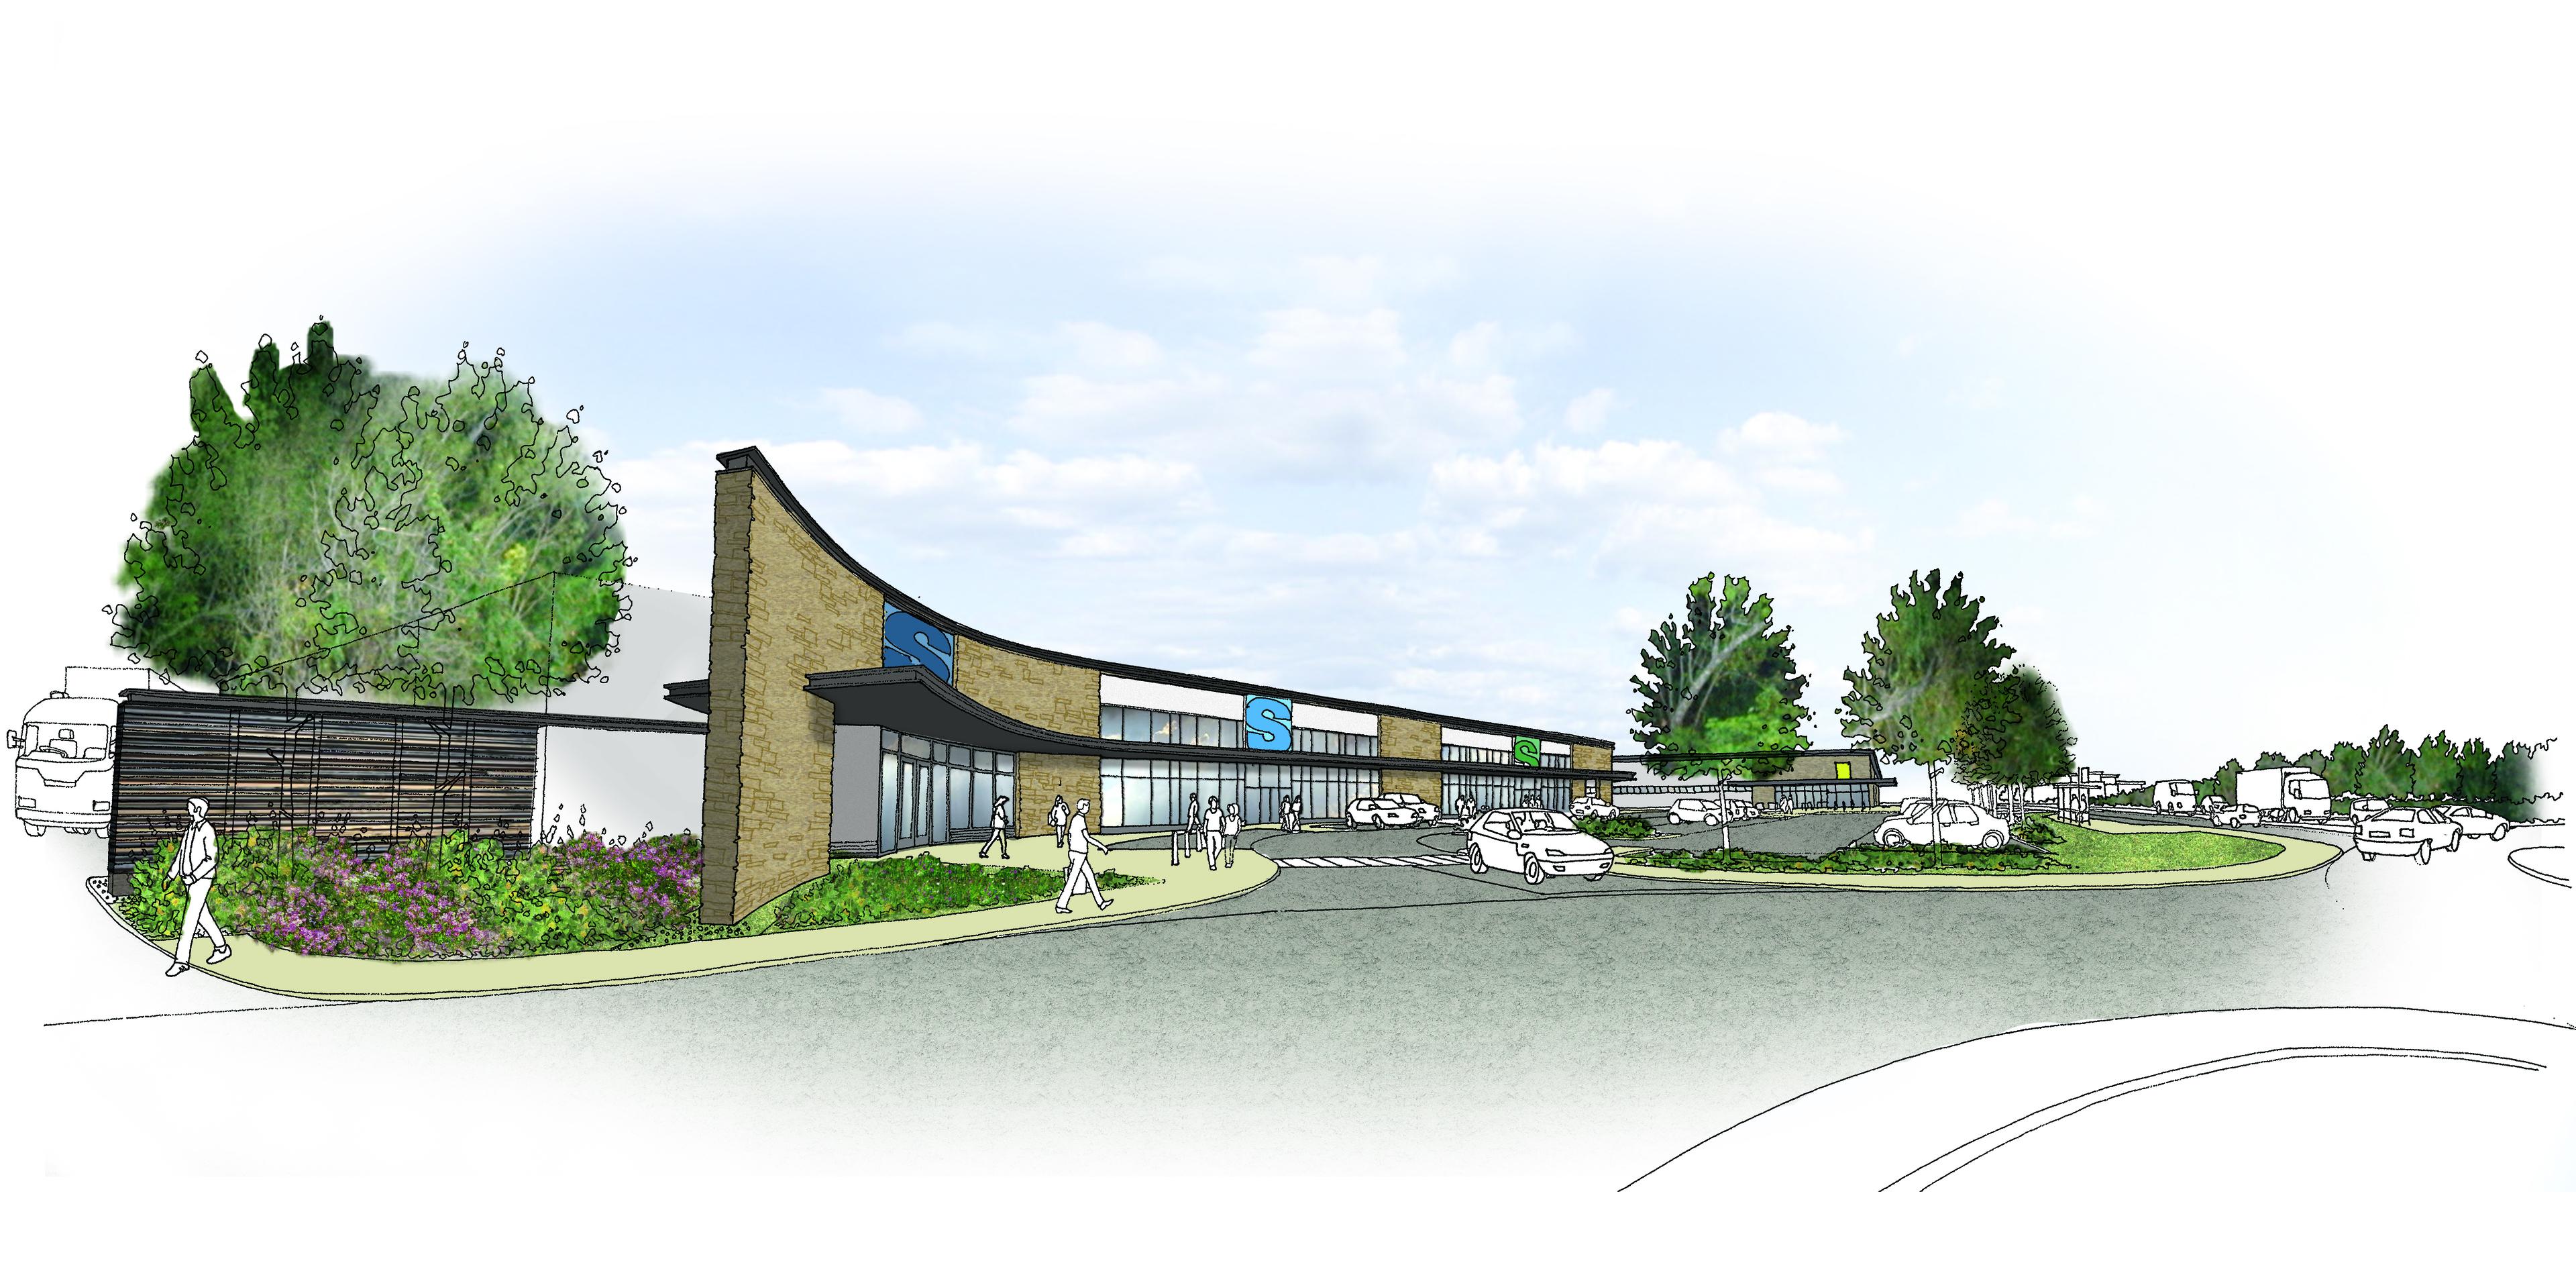 Artist's impression of proposed Fort William retail park